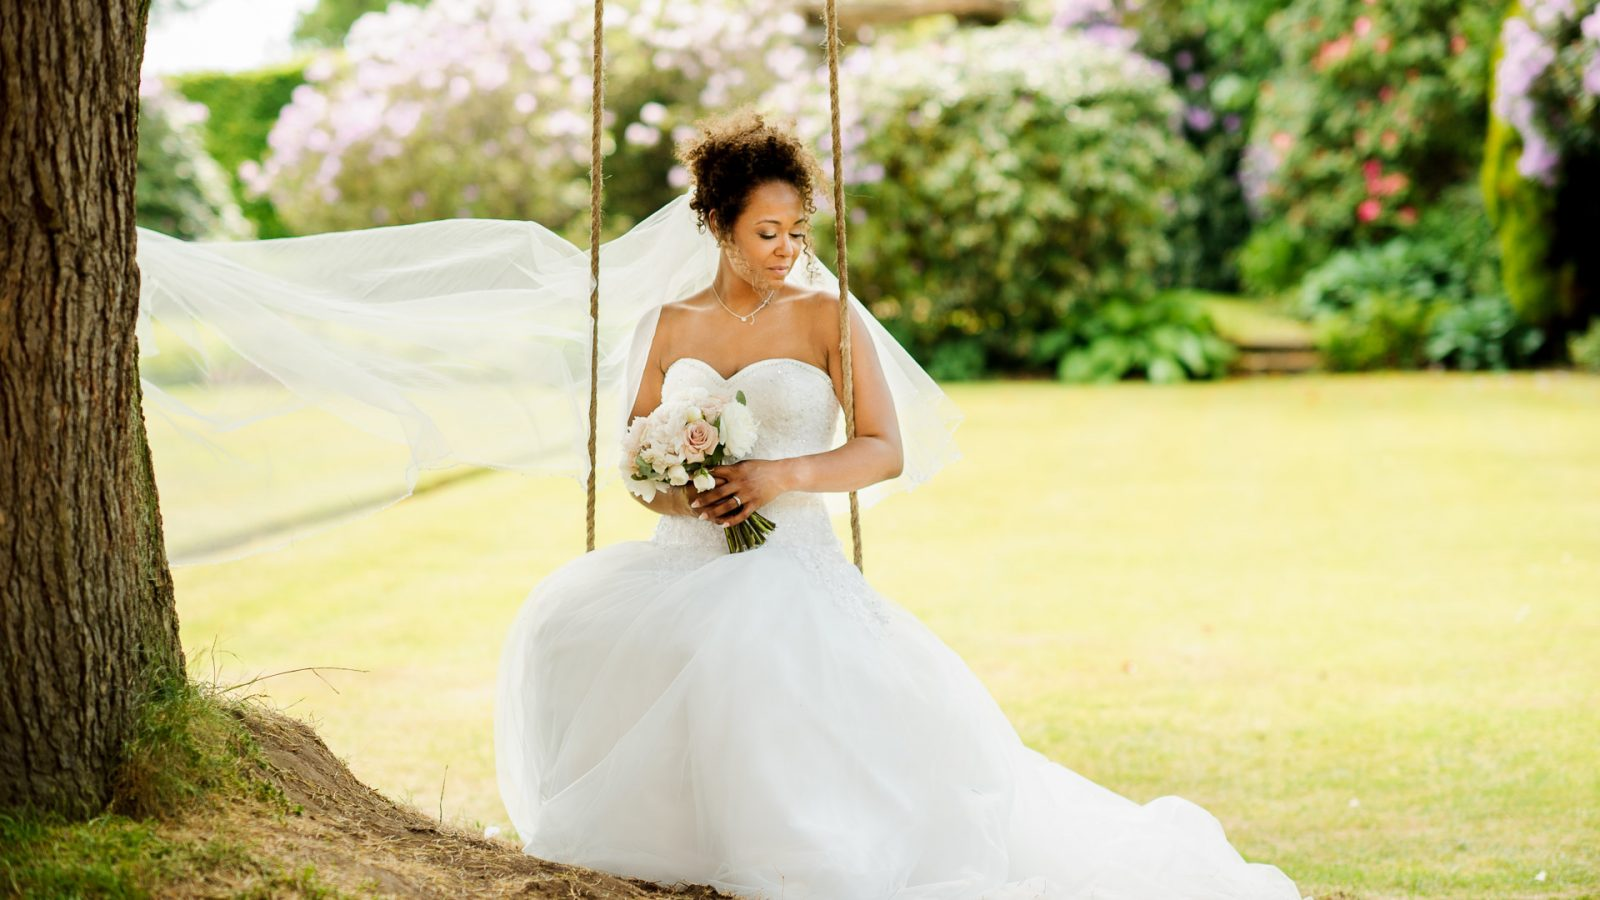 best-wedding-photos-2017-kimberley-and-joseph-bride-on-swing